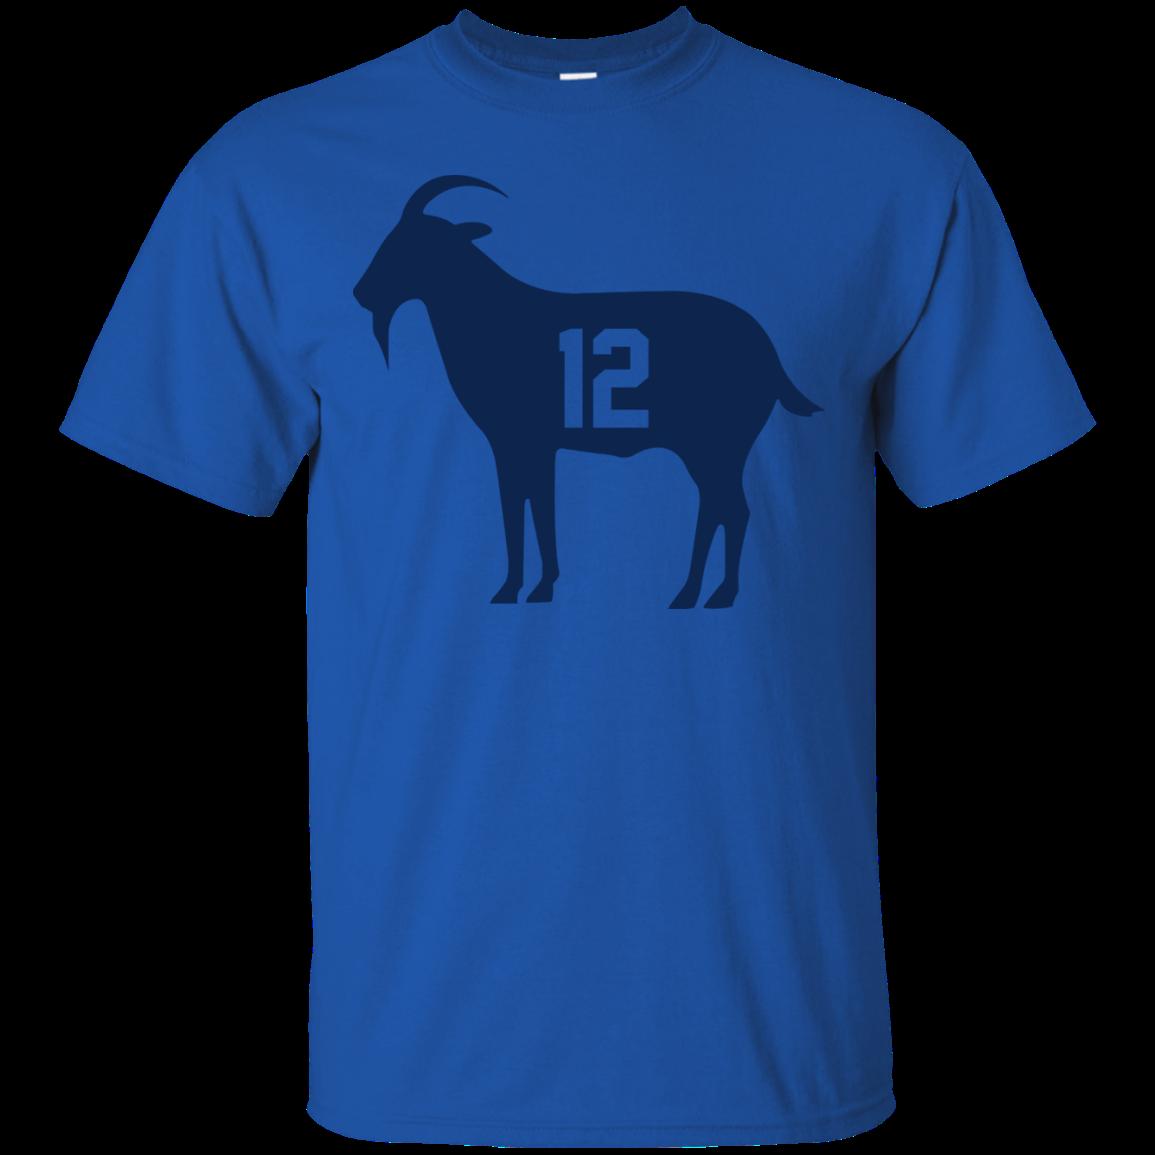 image 76px Goat Tb 12 Tom Brady T Shirt, Hoodies, Tank Top